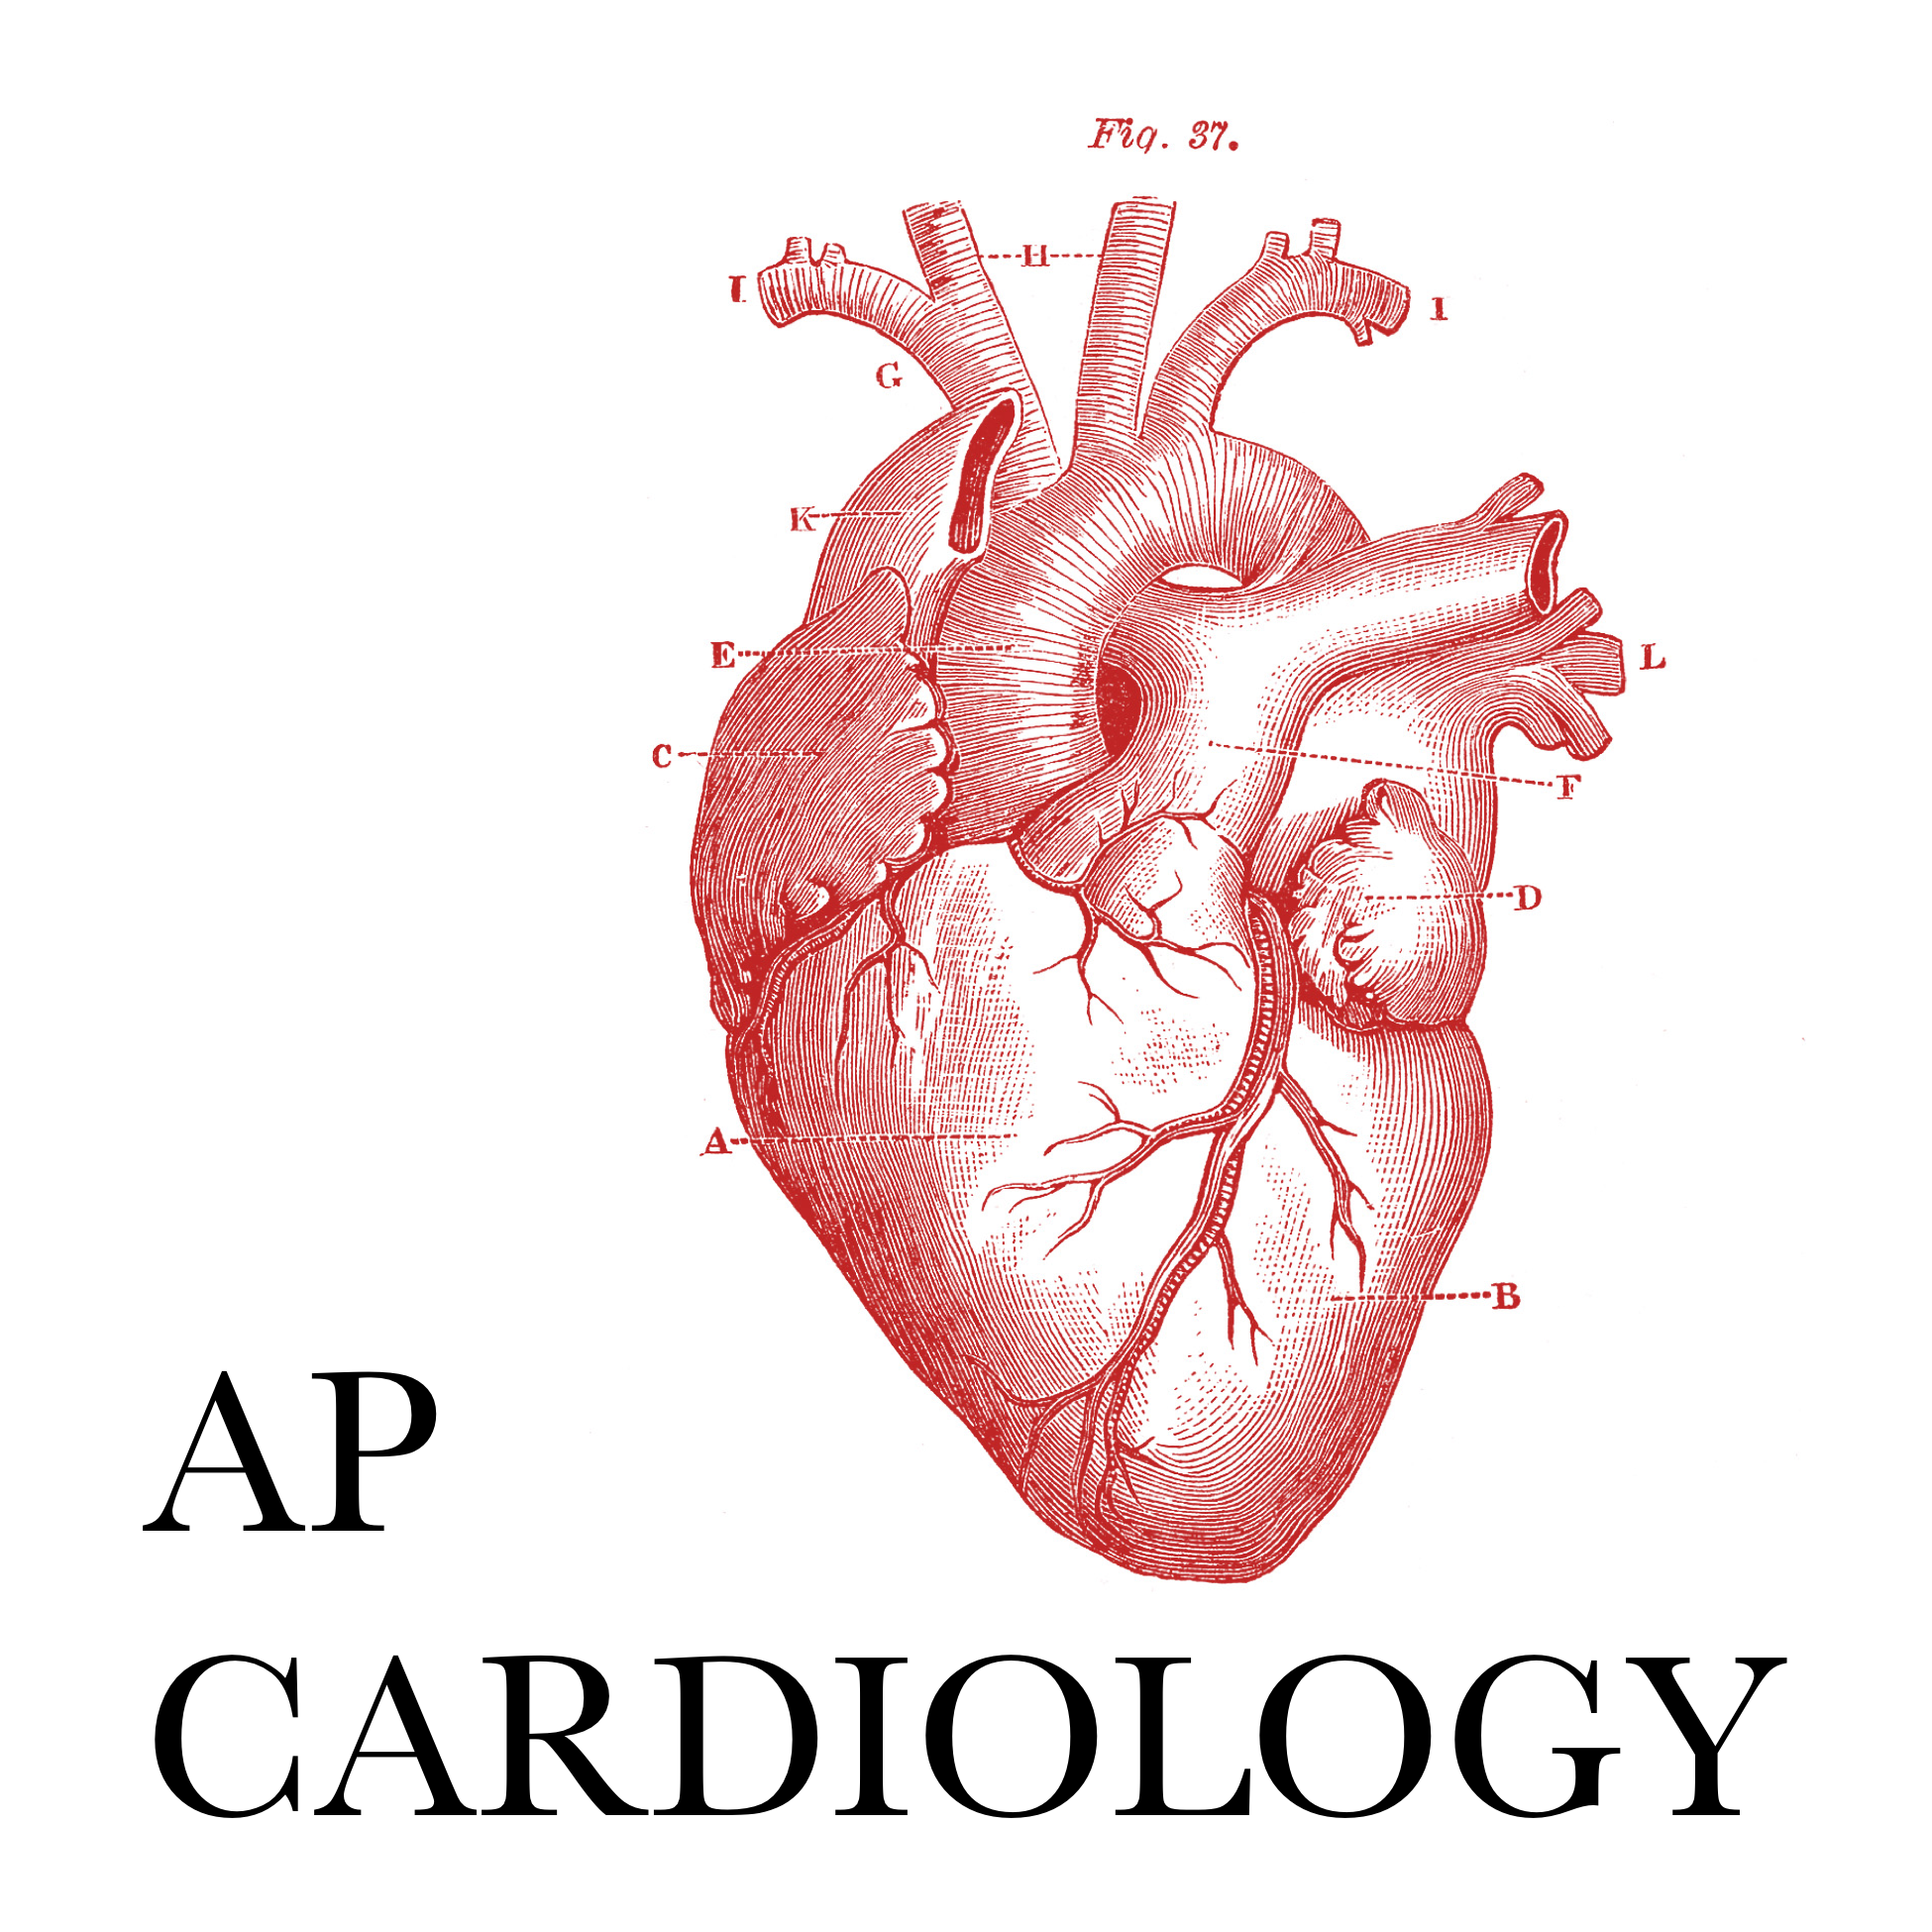 AP Cardiology